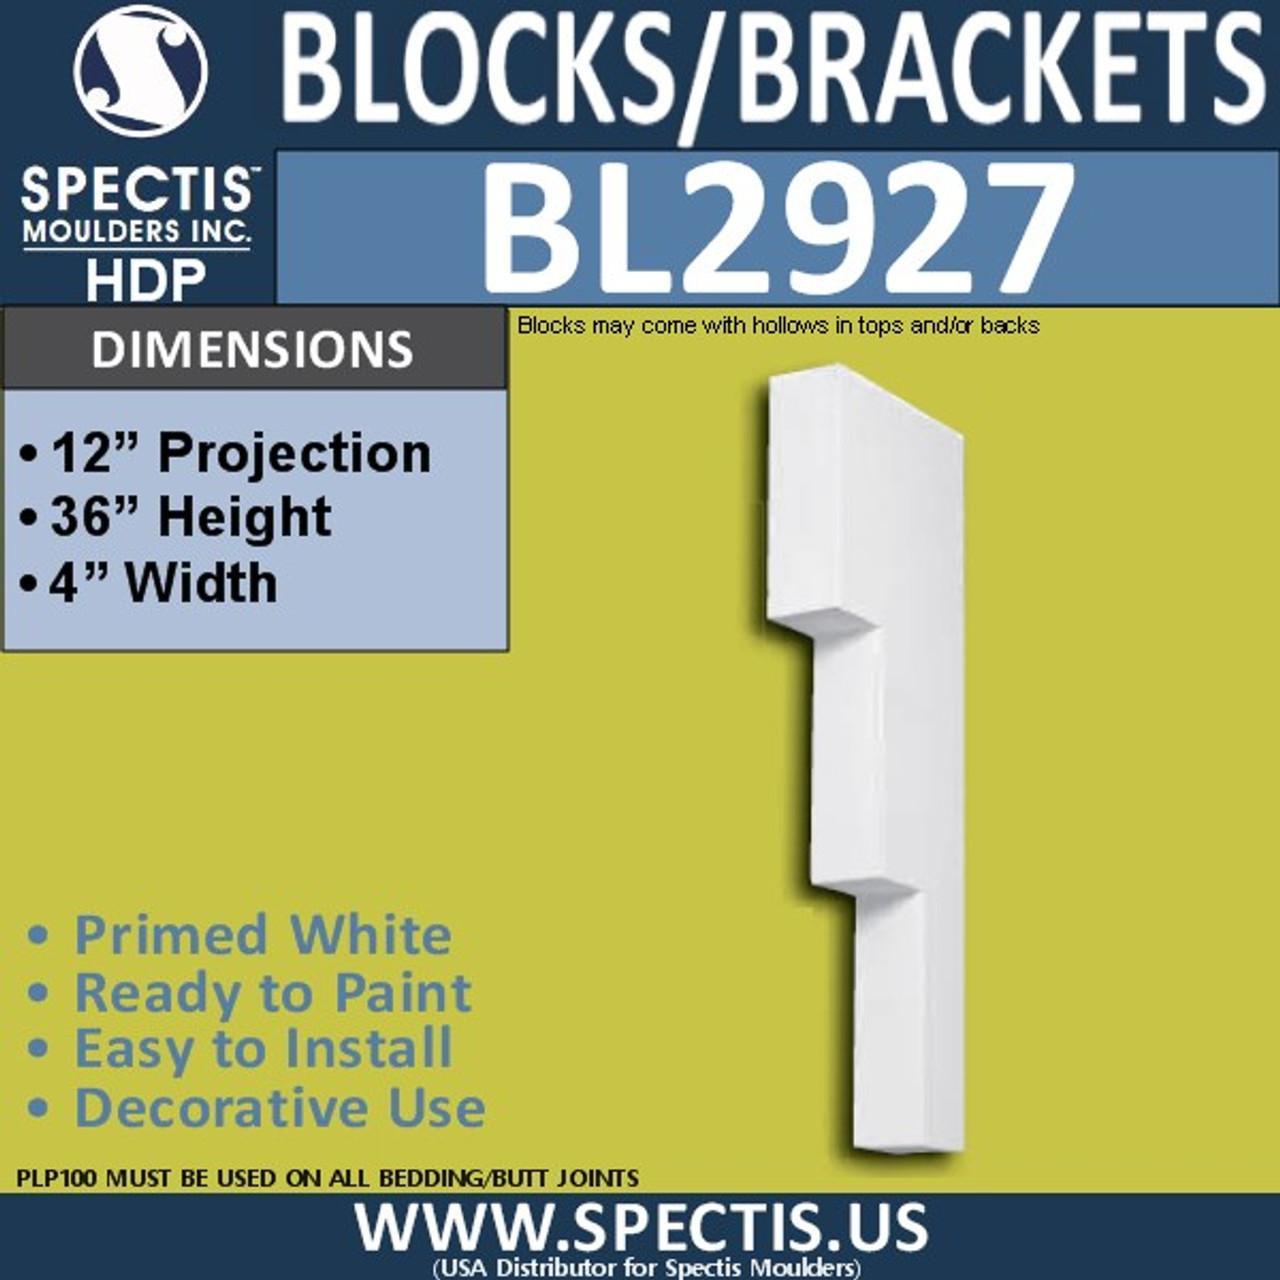 "BL2927 Eave Block or Bracket 4""W x 36""H x 12"" P"